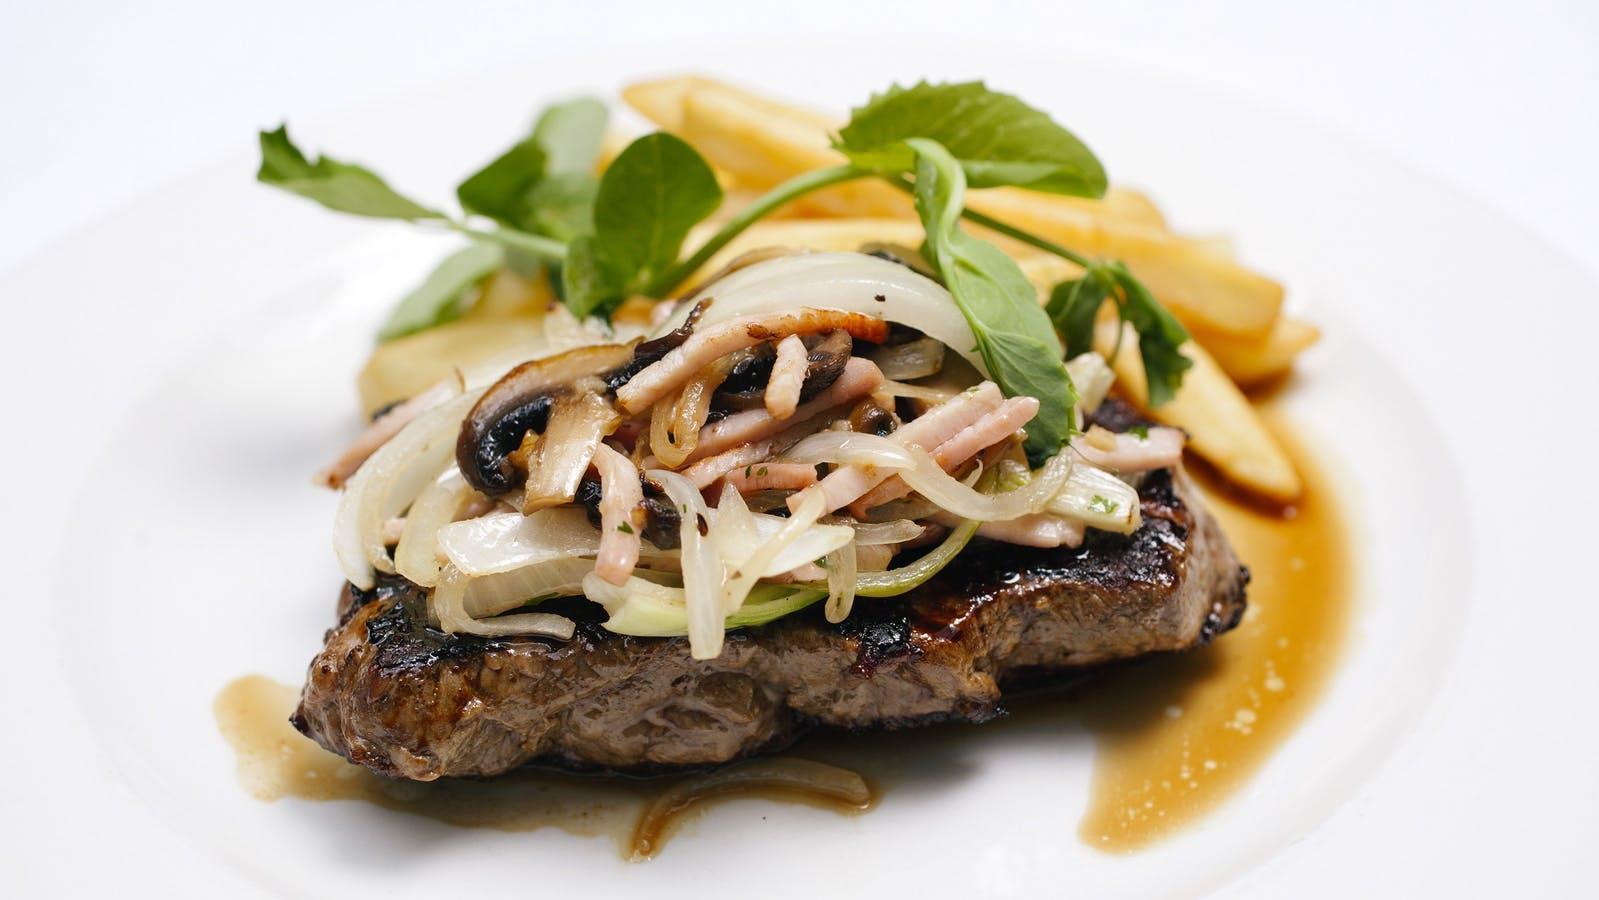 Macey's Famous Porterhouse Steak